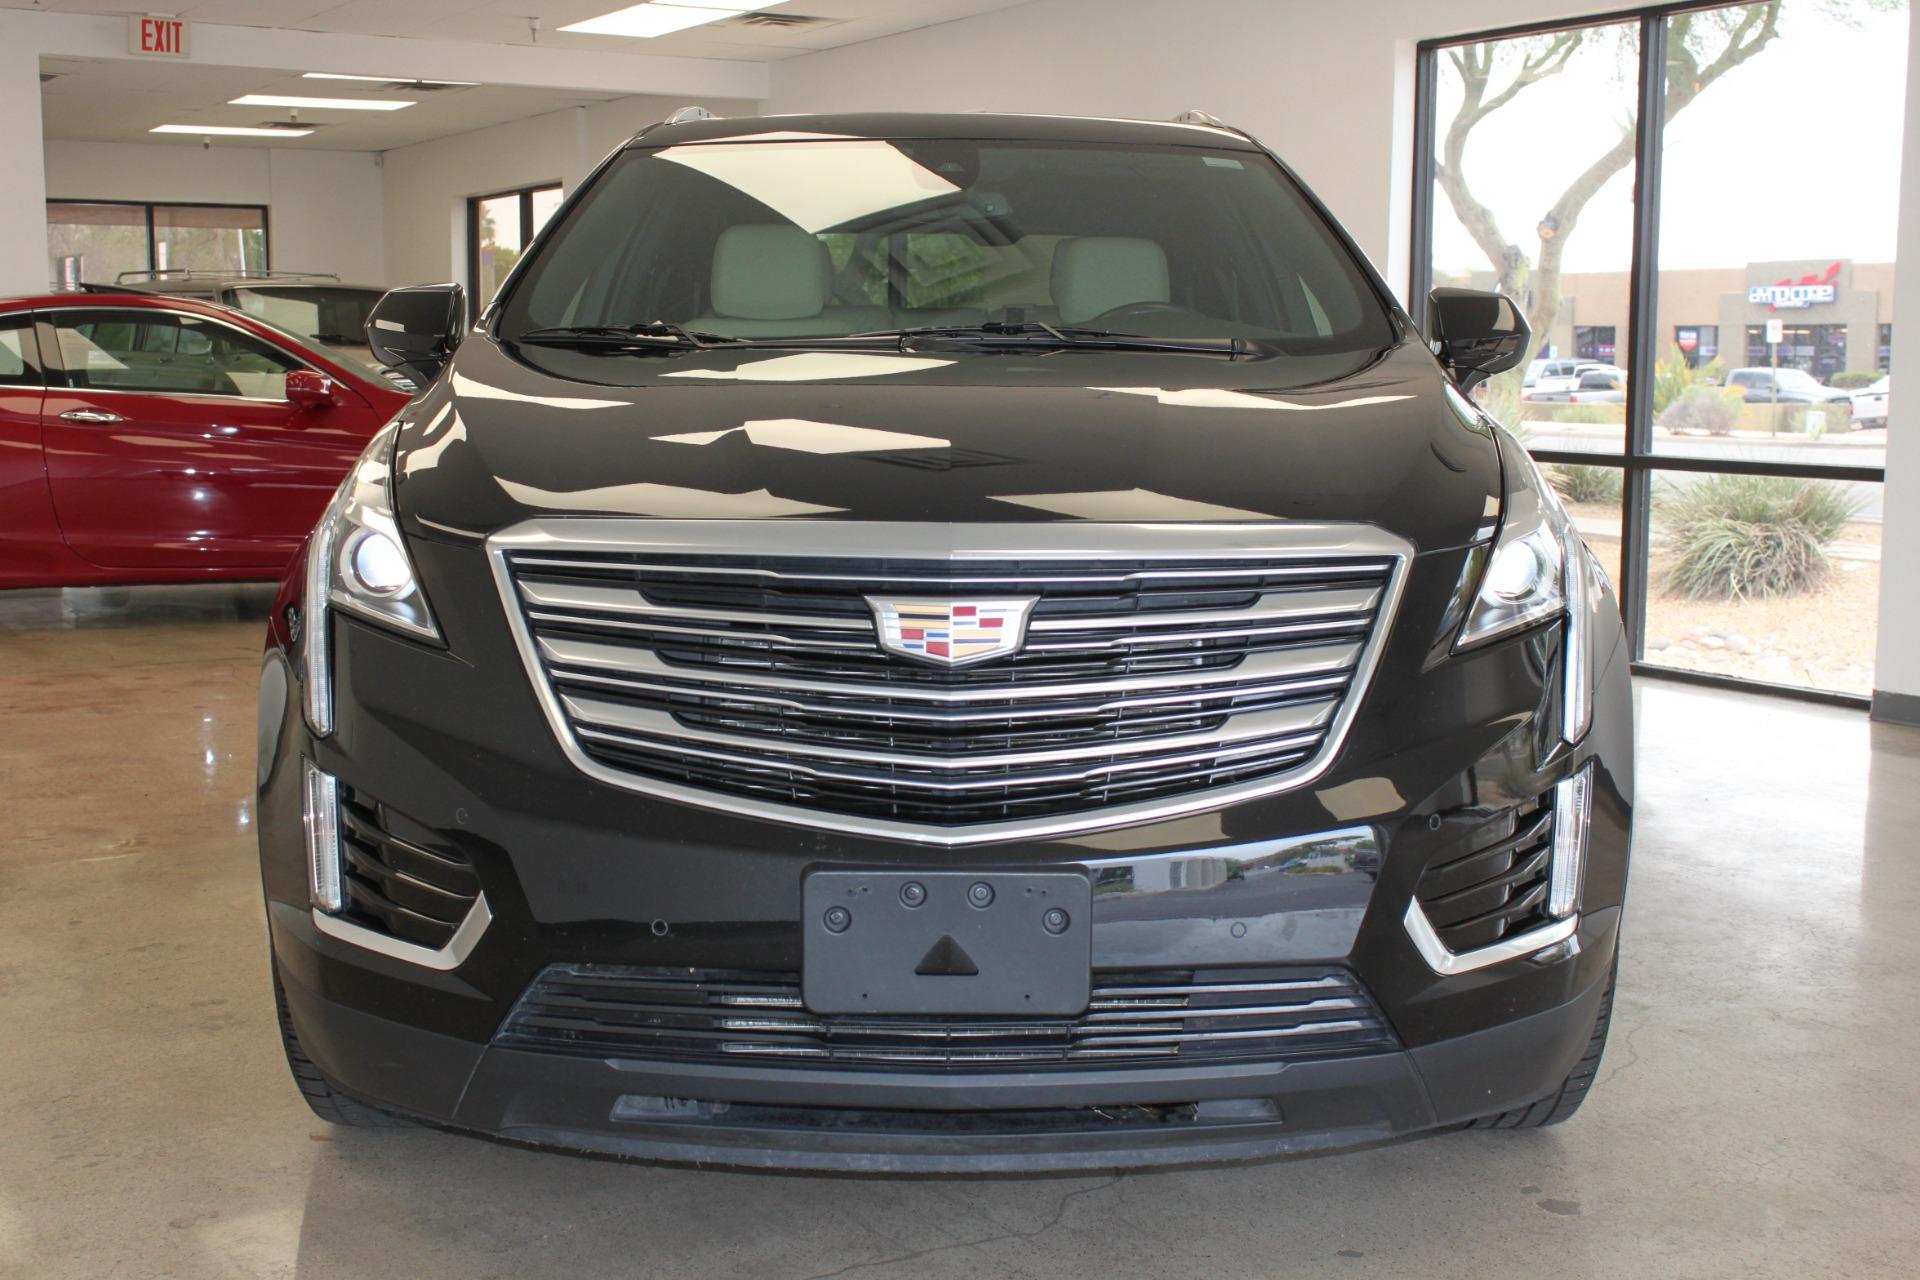 Used-2017-Cadillac-XT5-Luxury-All-Wheel-Drive-Luxury-AWD-Cherokee